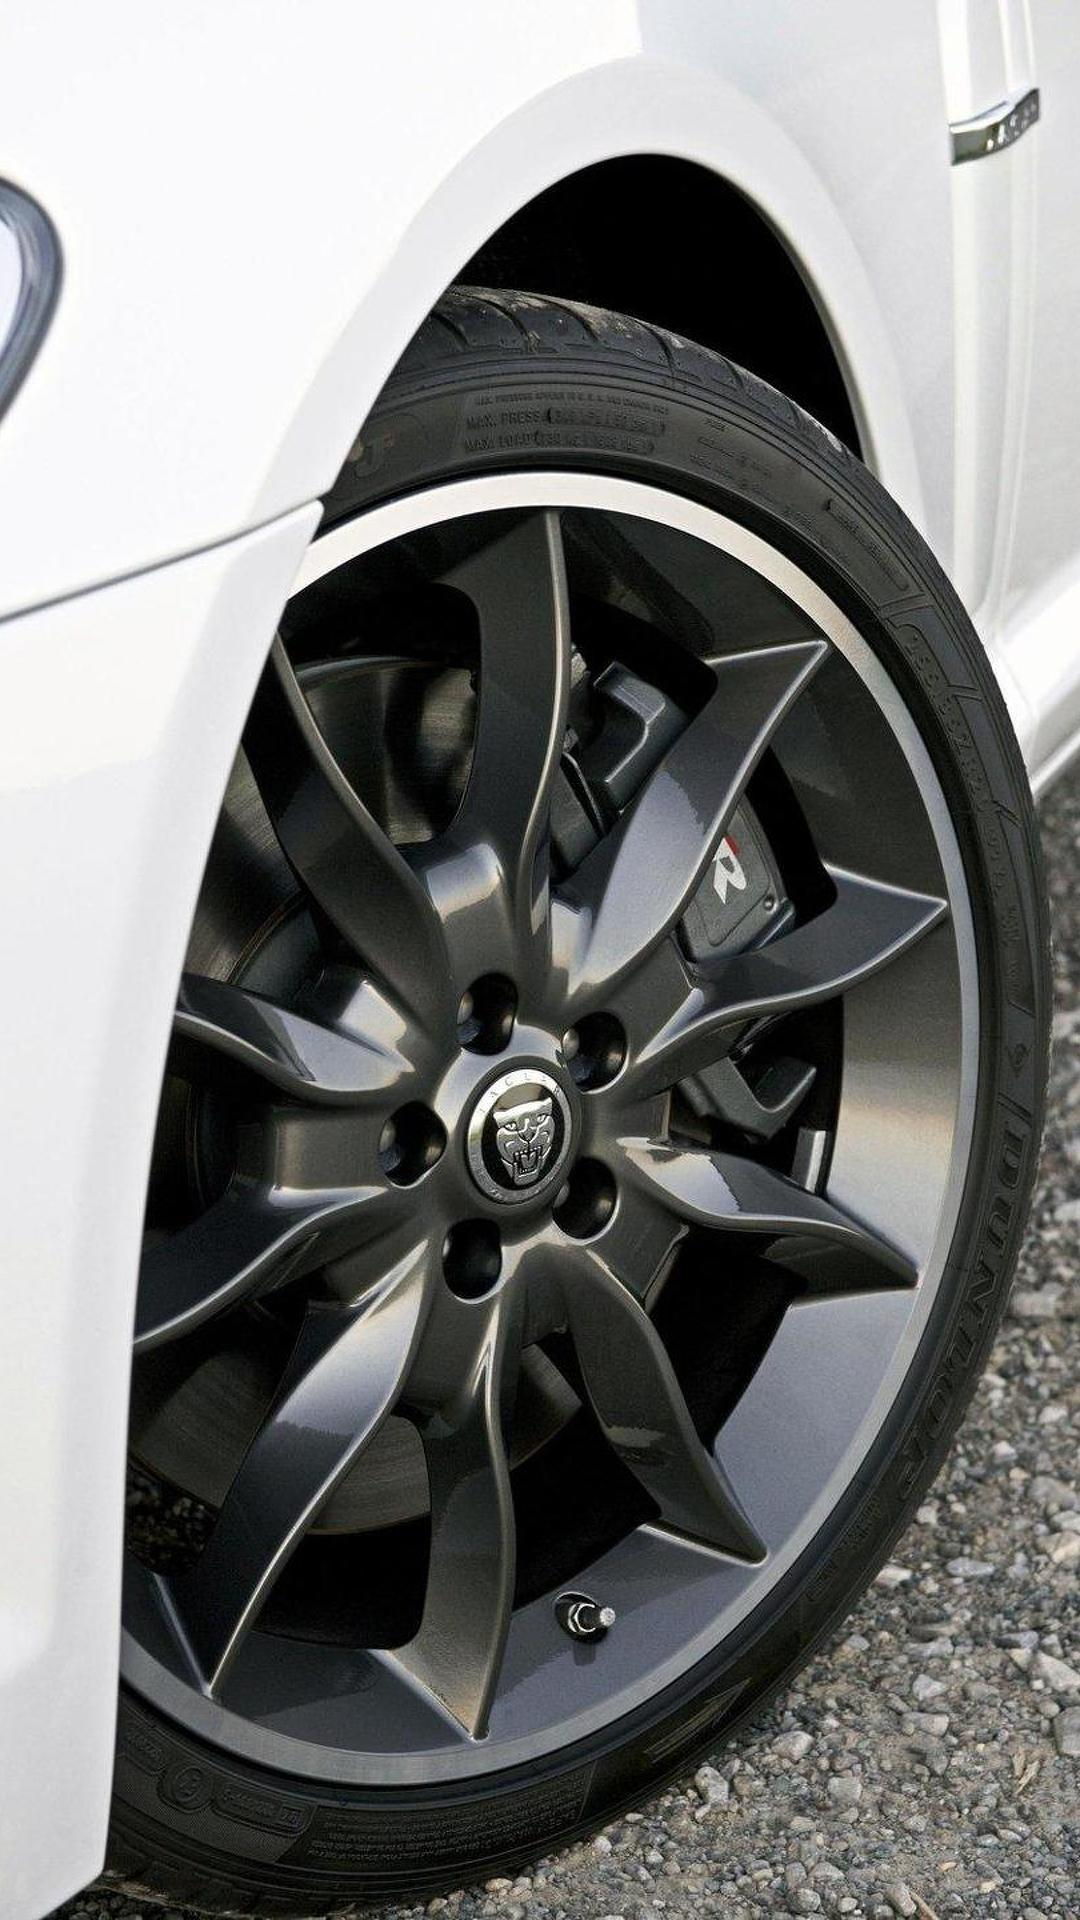 rim catalog page jaguar factory front for original sale wheels xe used wheel